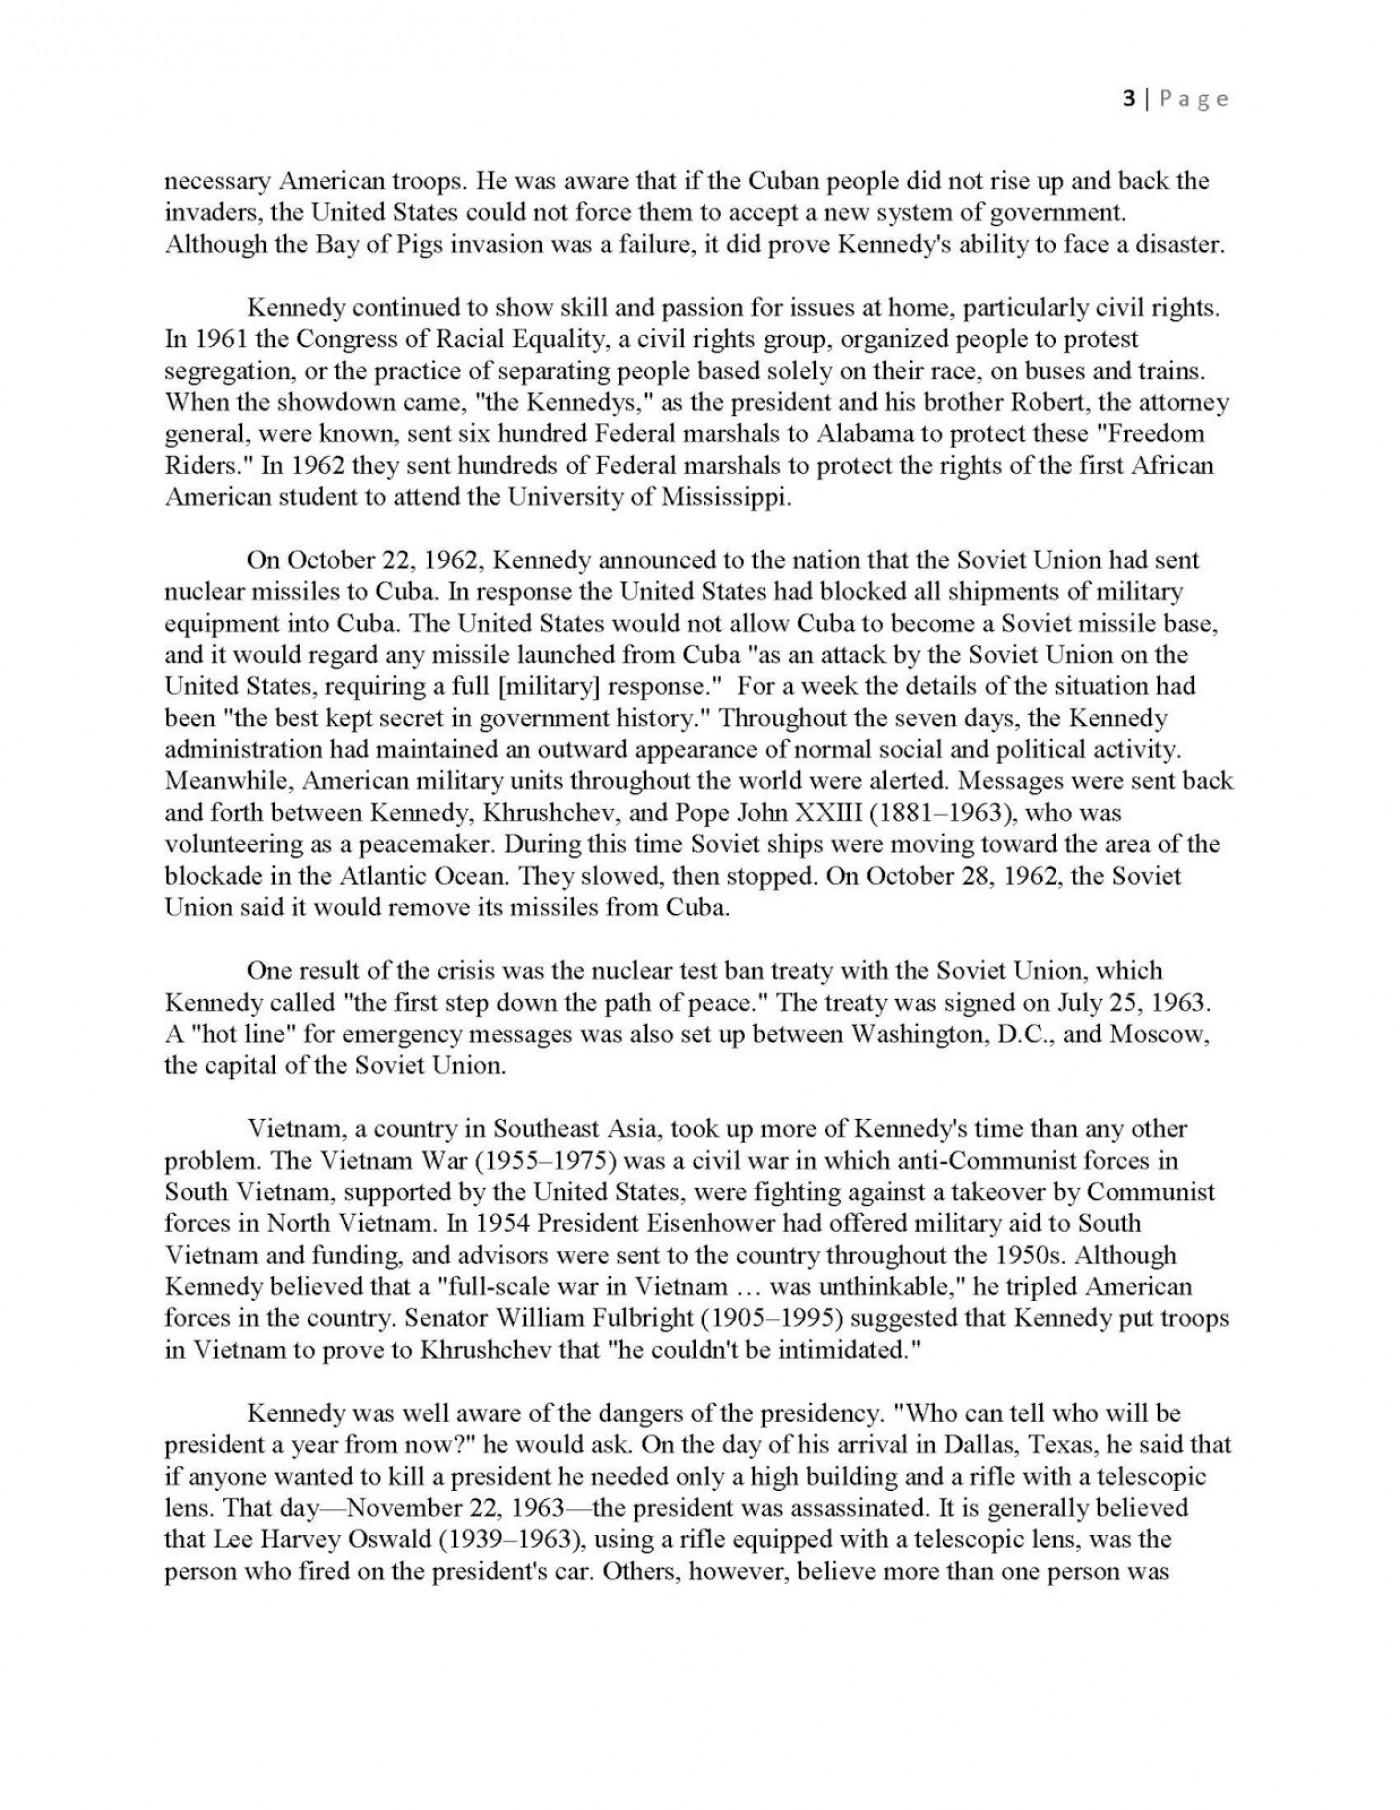 010 Essay Example Interview Jfkmlashortformbiographyreportexample Page 3 Shocking Examples Mla Format Profile Apa 1400